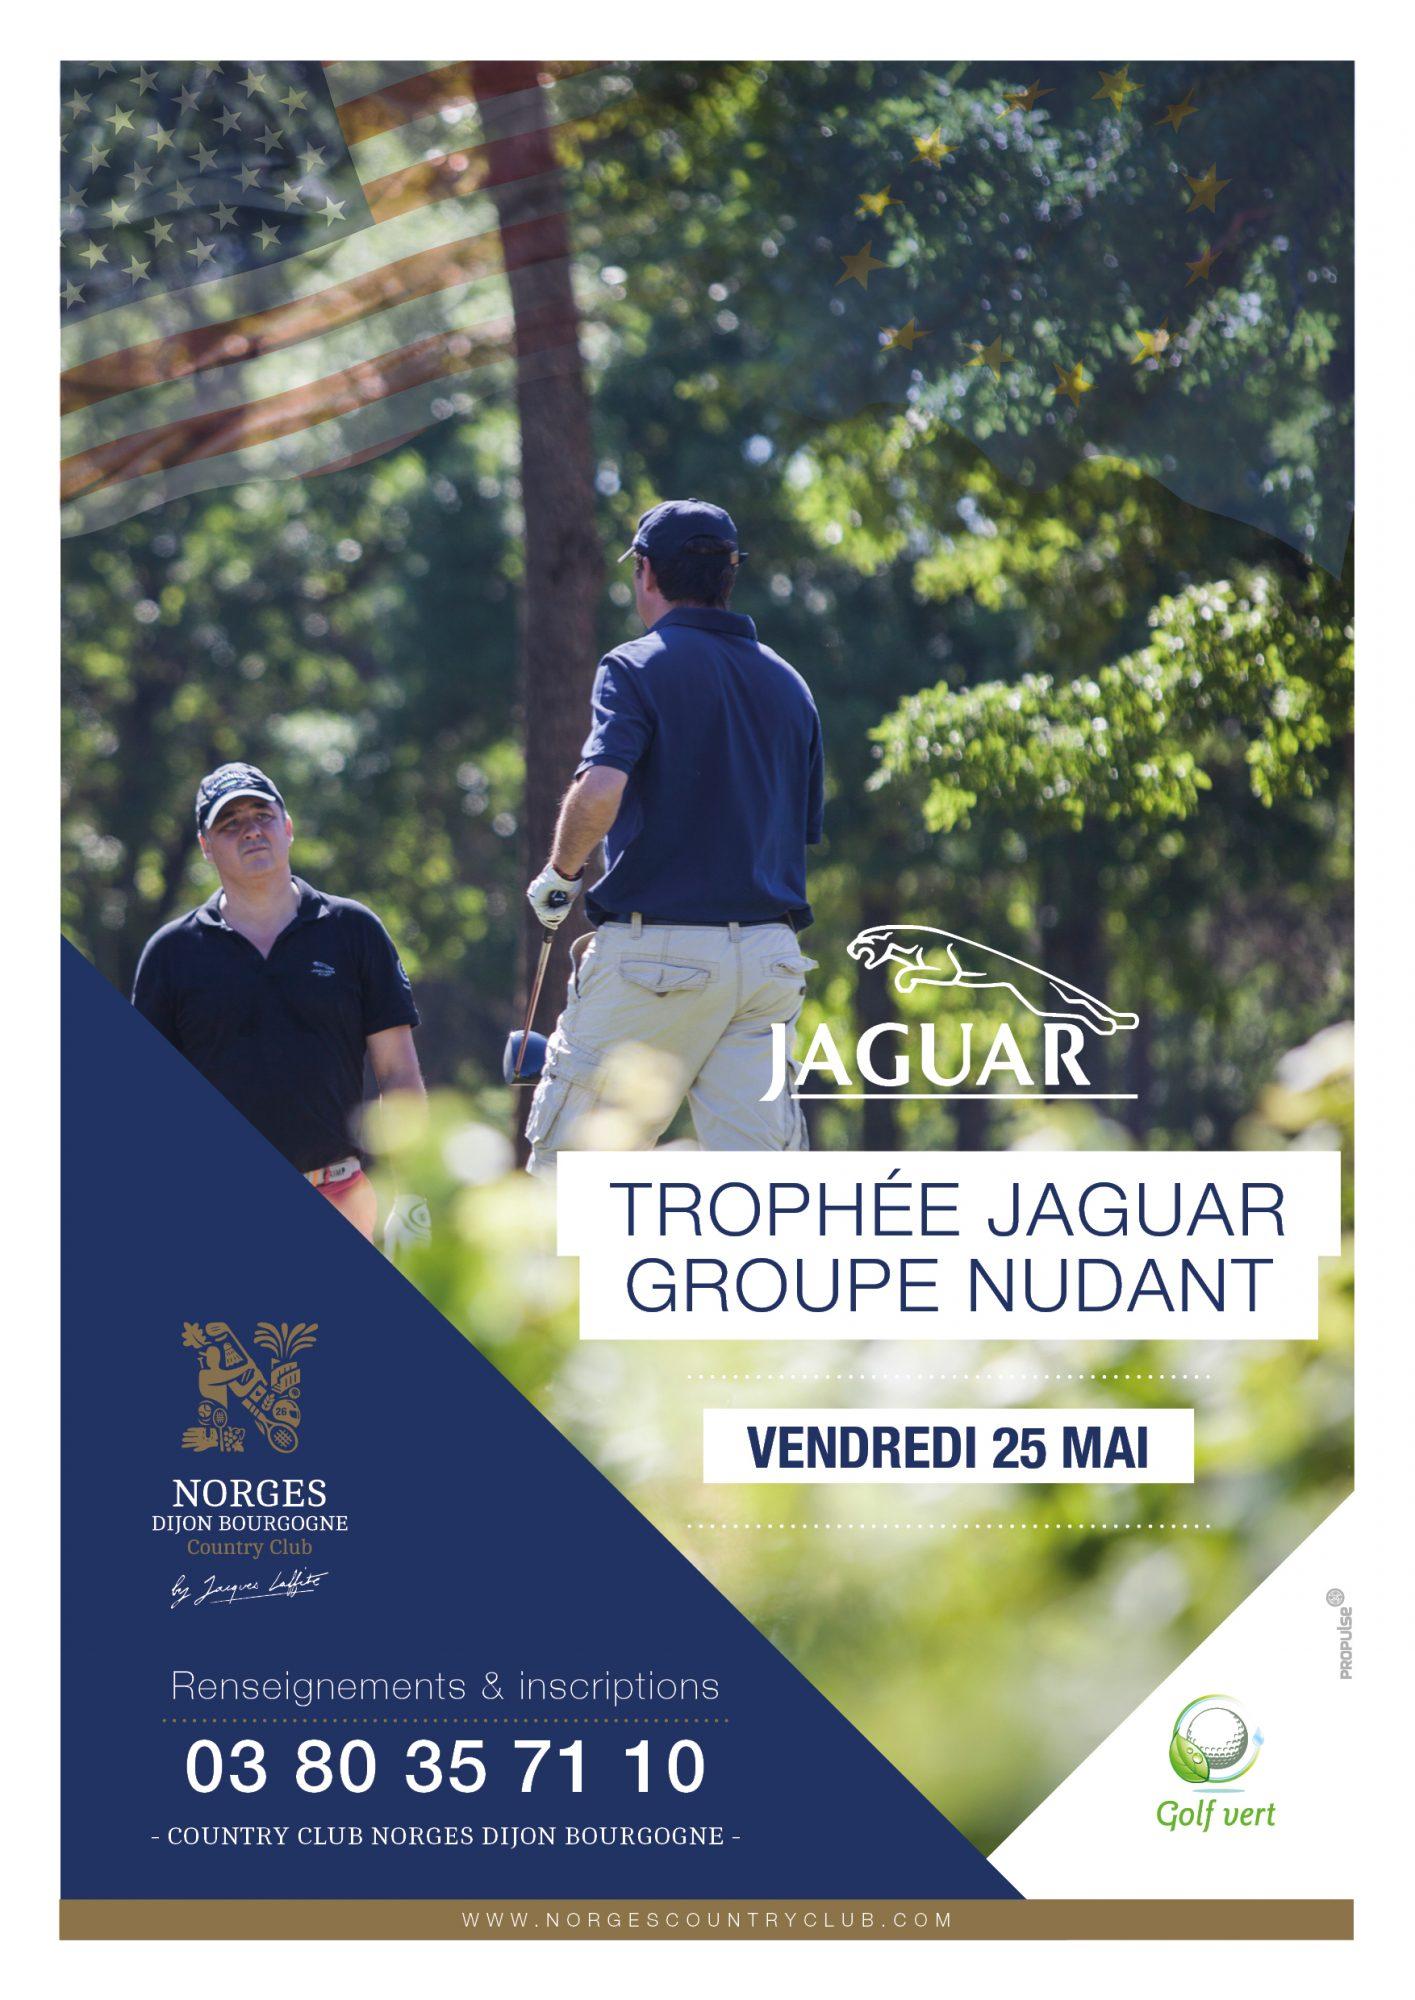 Trophée Jaguar - Groupe Nudant